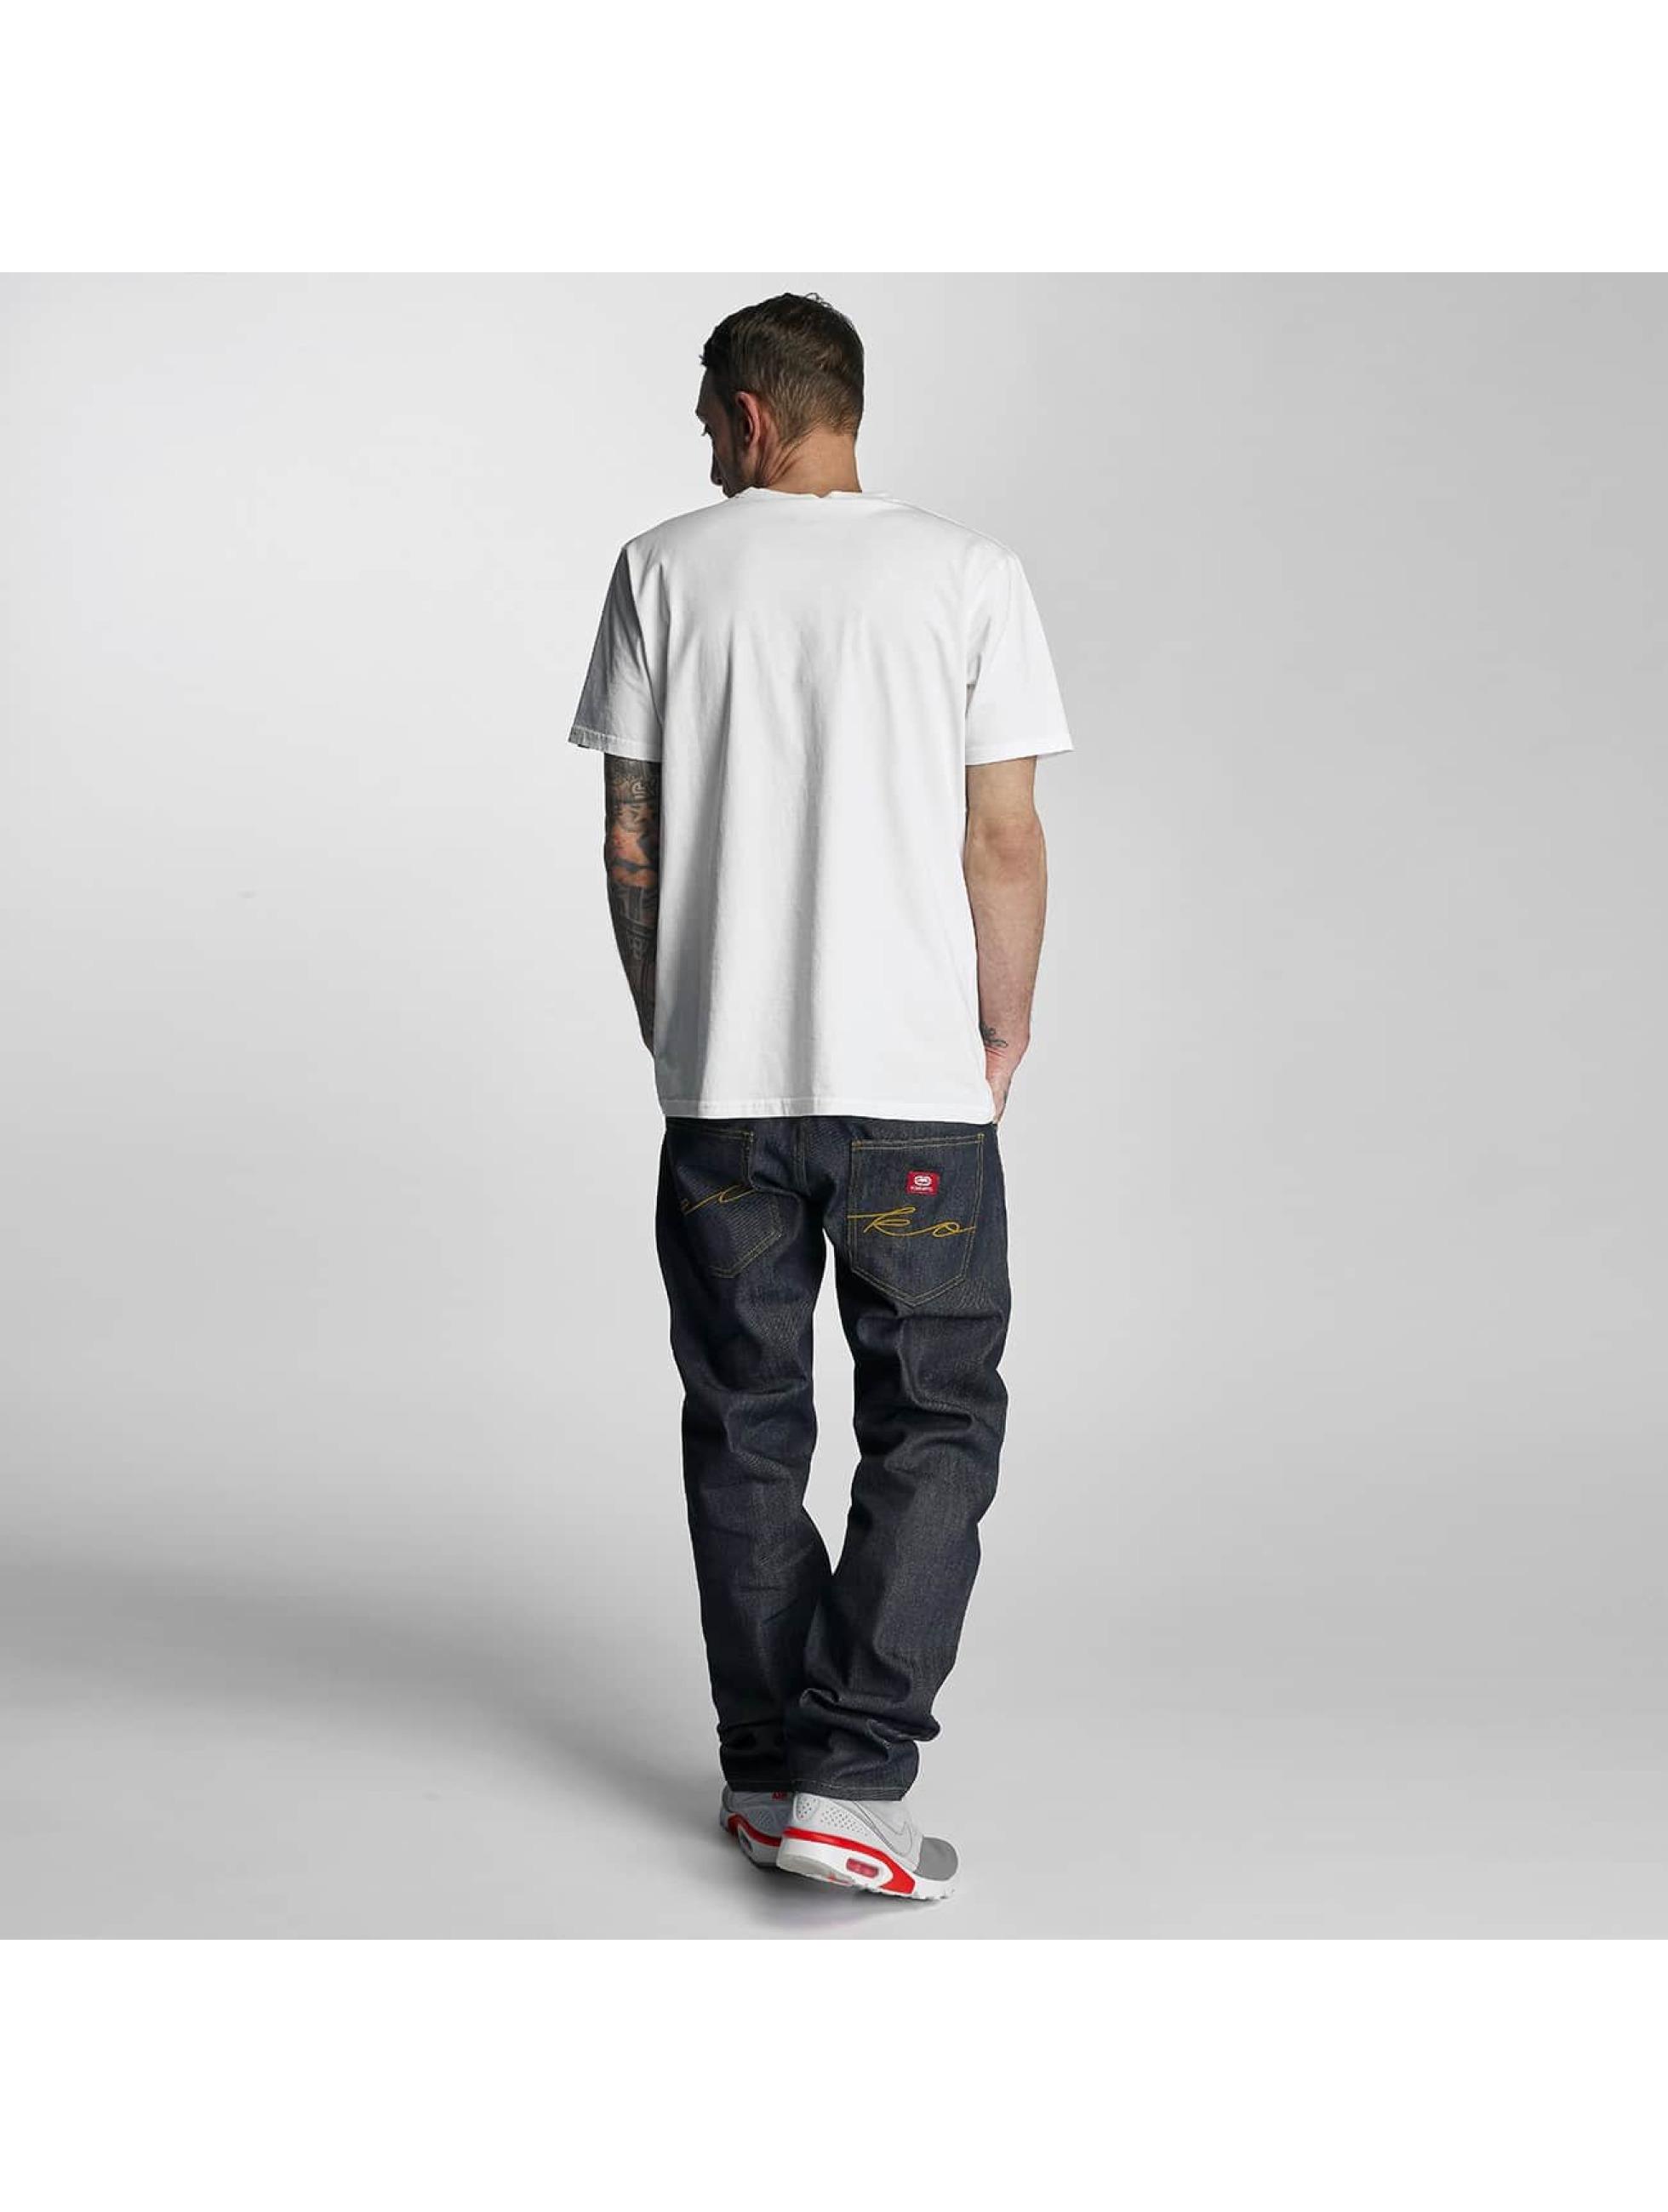 Ecko Unltd. Straight Fit Jeans Selvedge Soo indigo